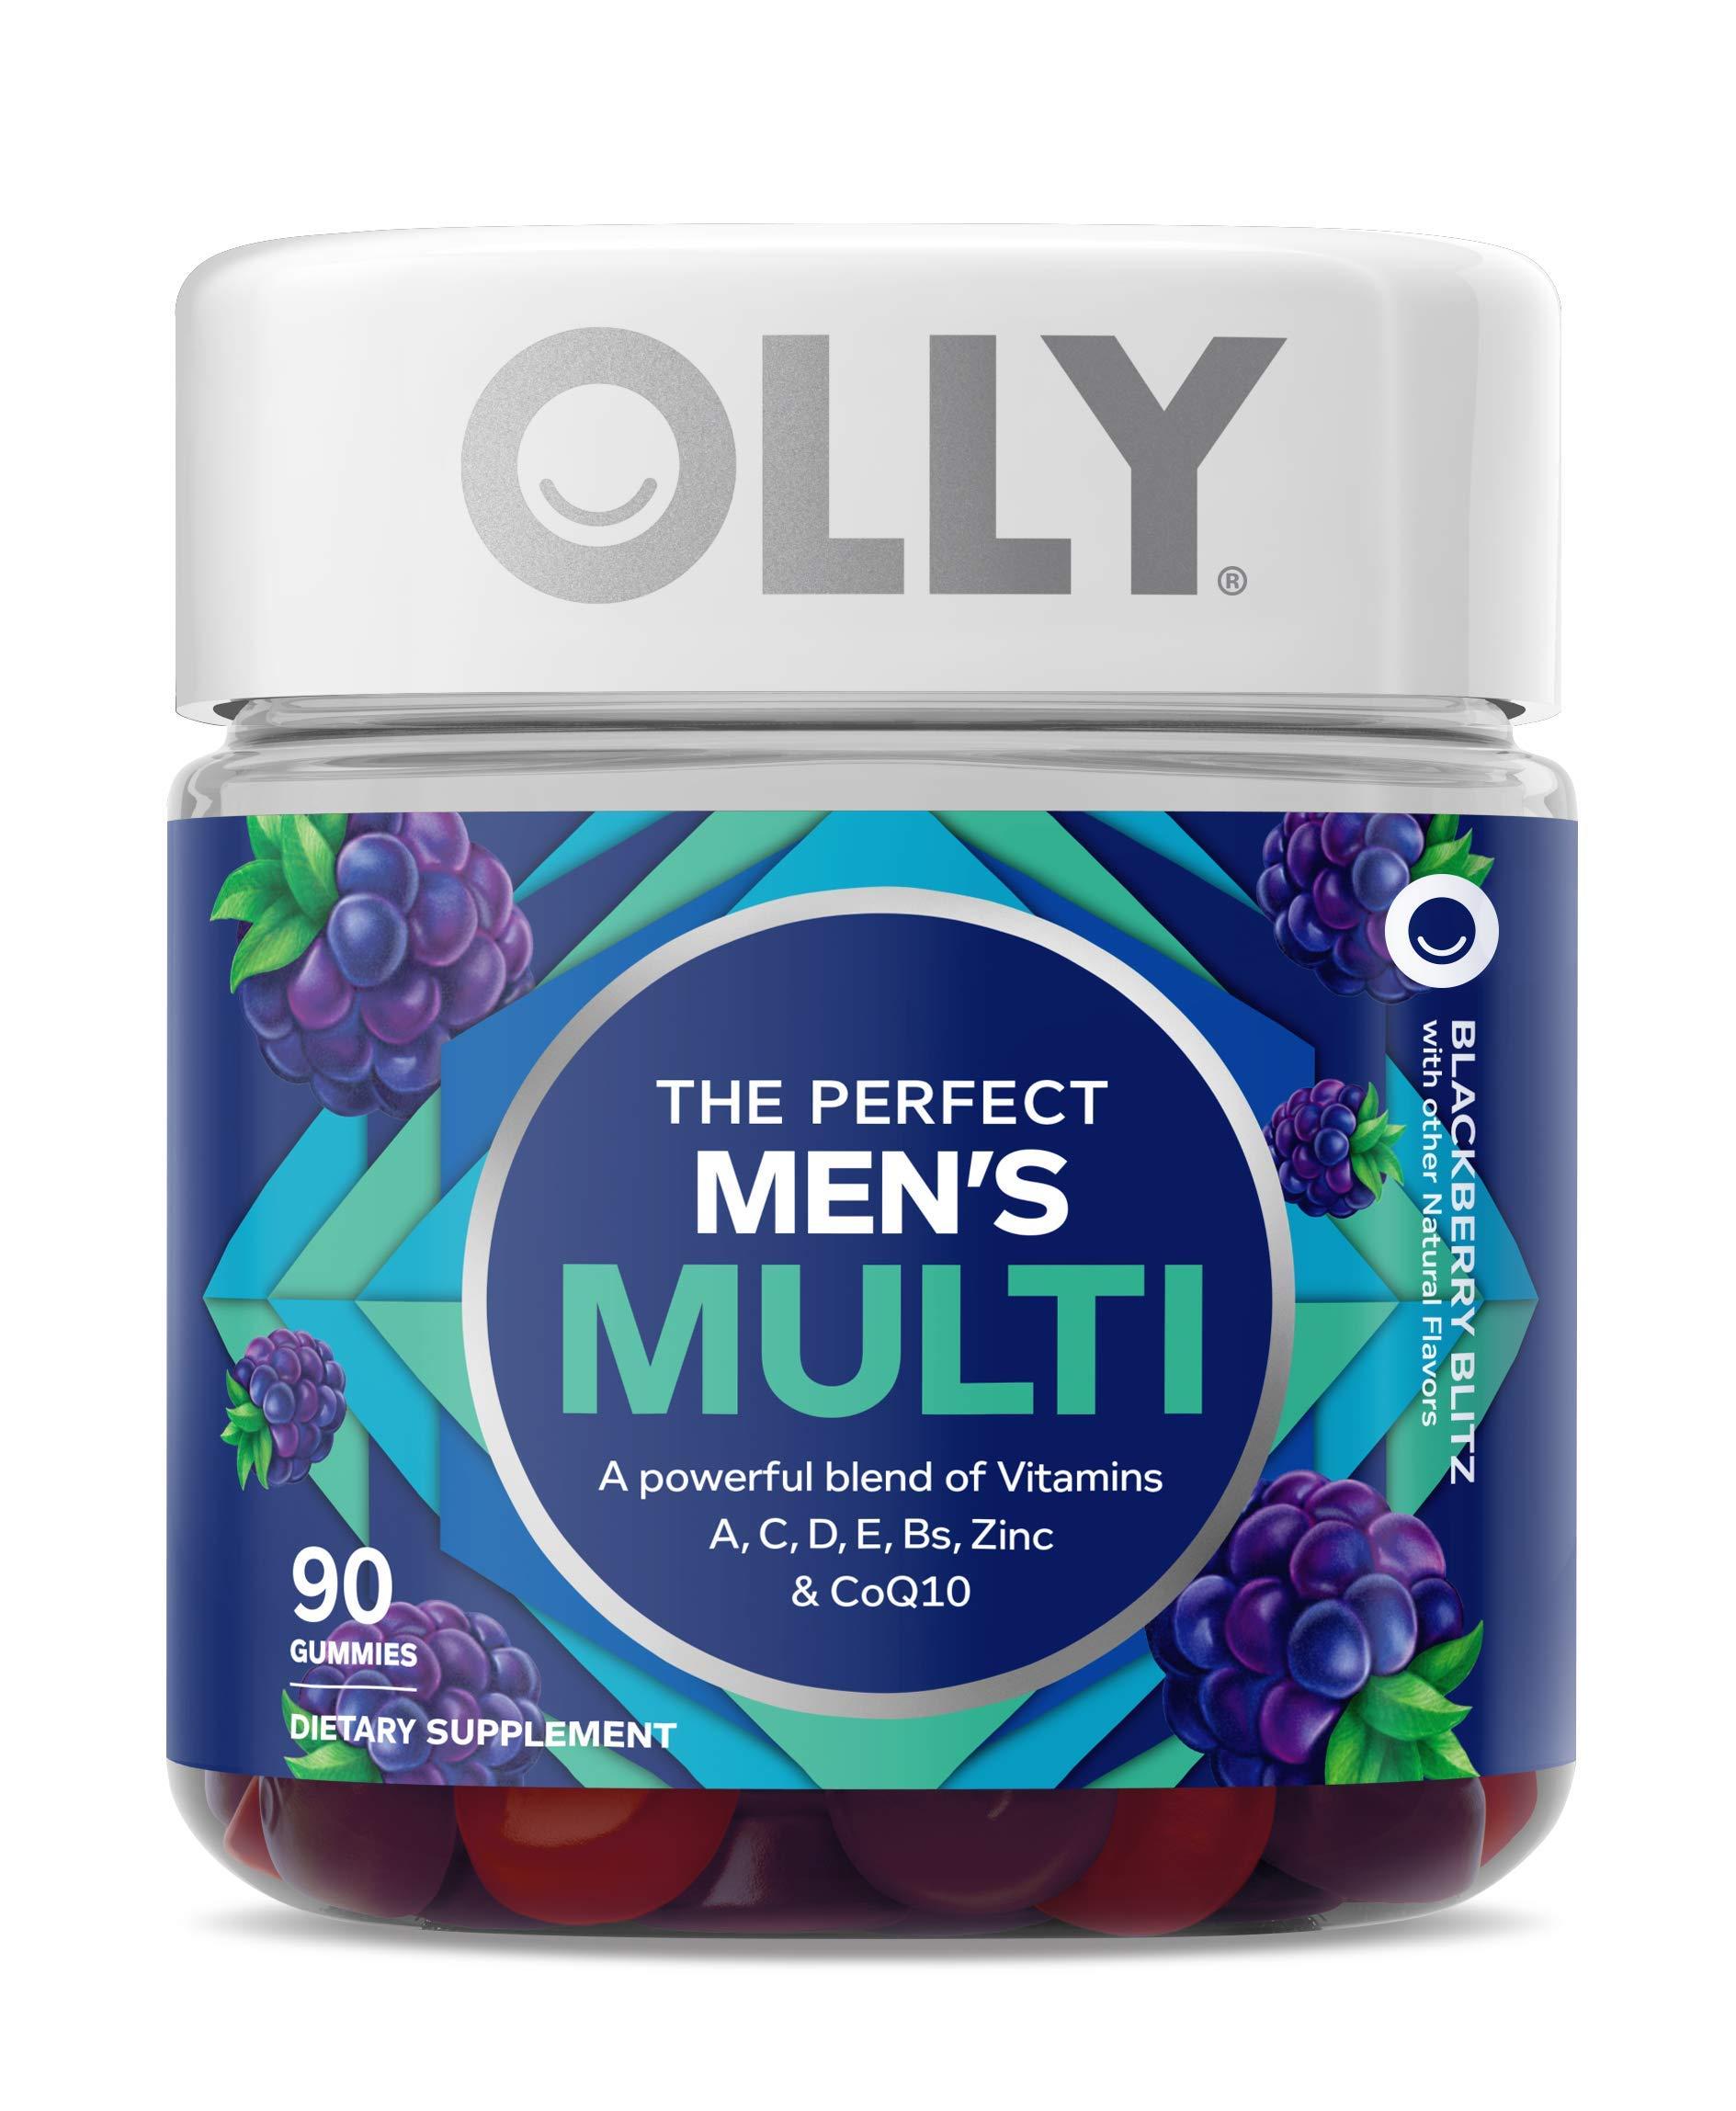 OLLY Men's Multivitamin Gummy, Vitamins A, C, D, E, B, Zinc, Adult Chewable Supplement, Blackberry Flavor, 45 Day Supply - 90 Count